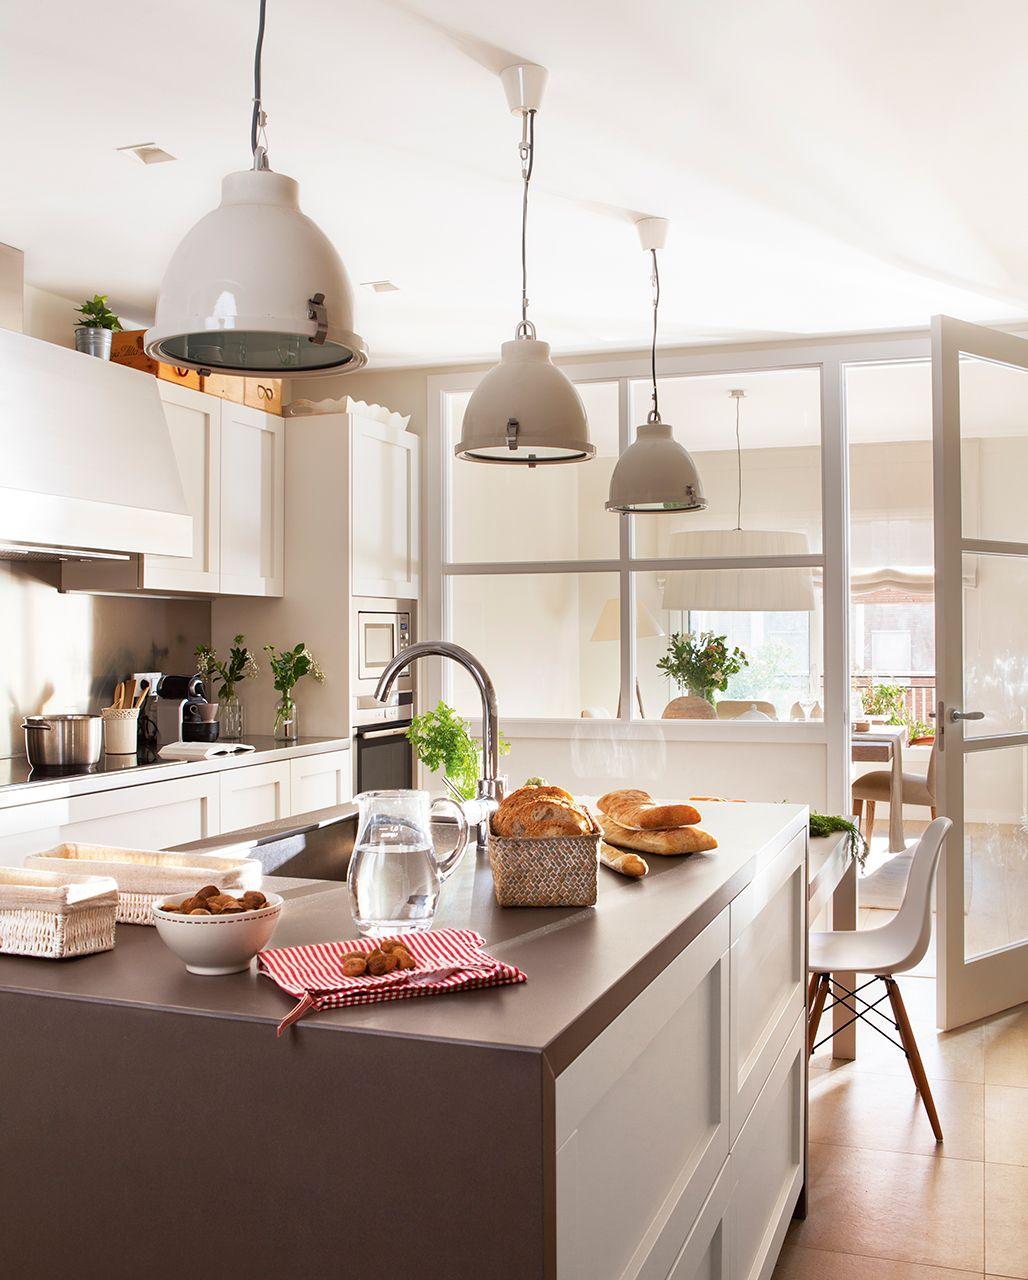 El cuarto de Jorge.  Cuisines maison, Idee amenagement cuisine